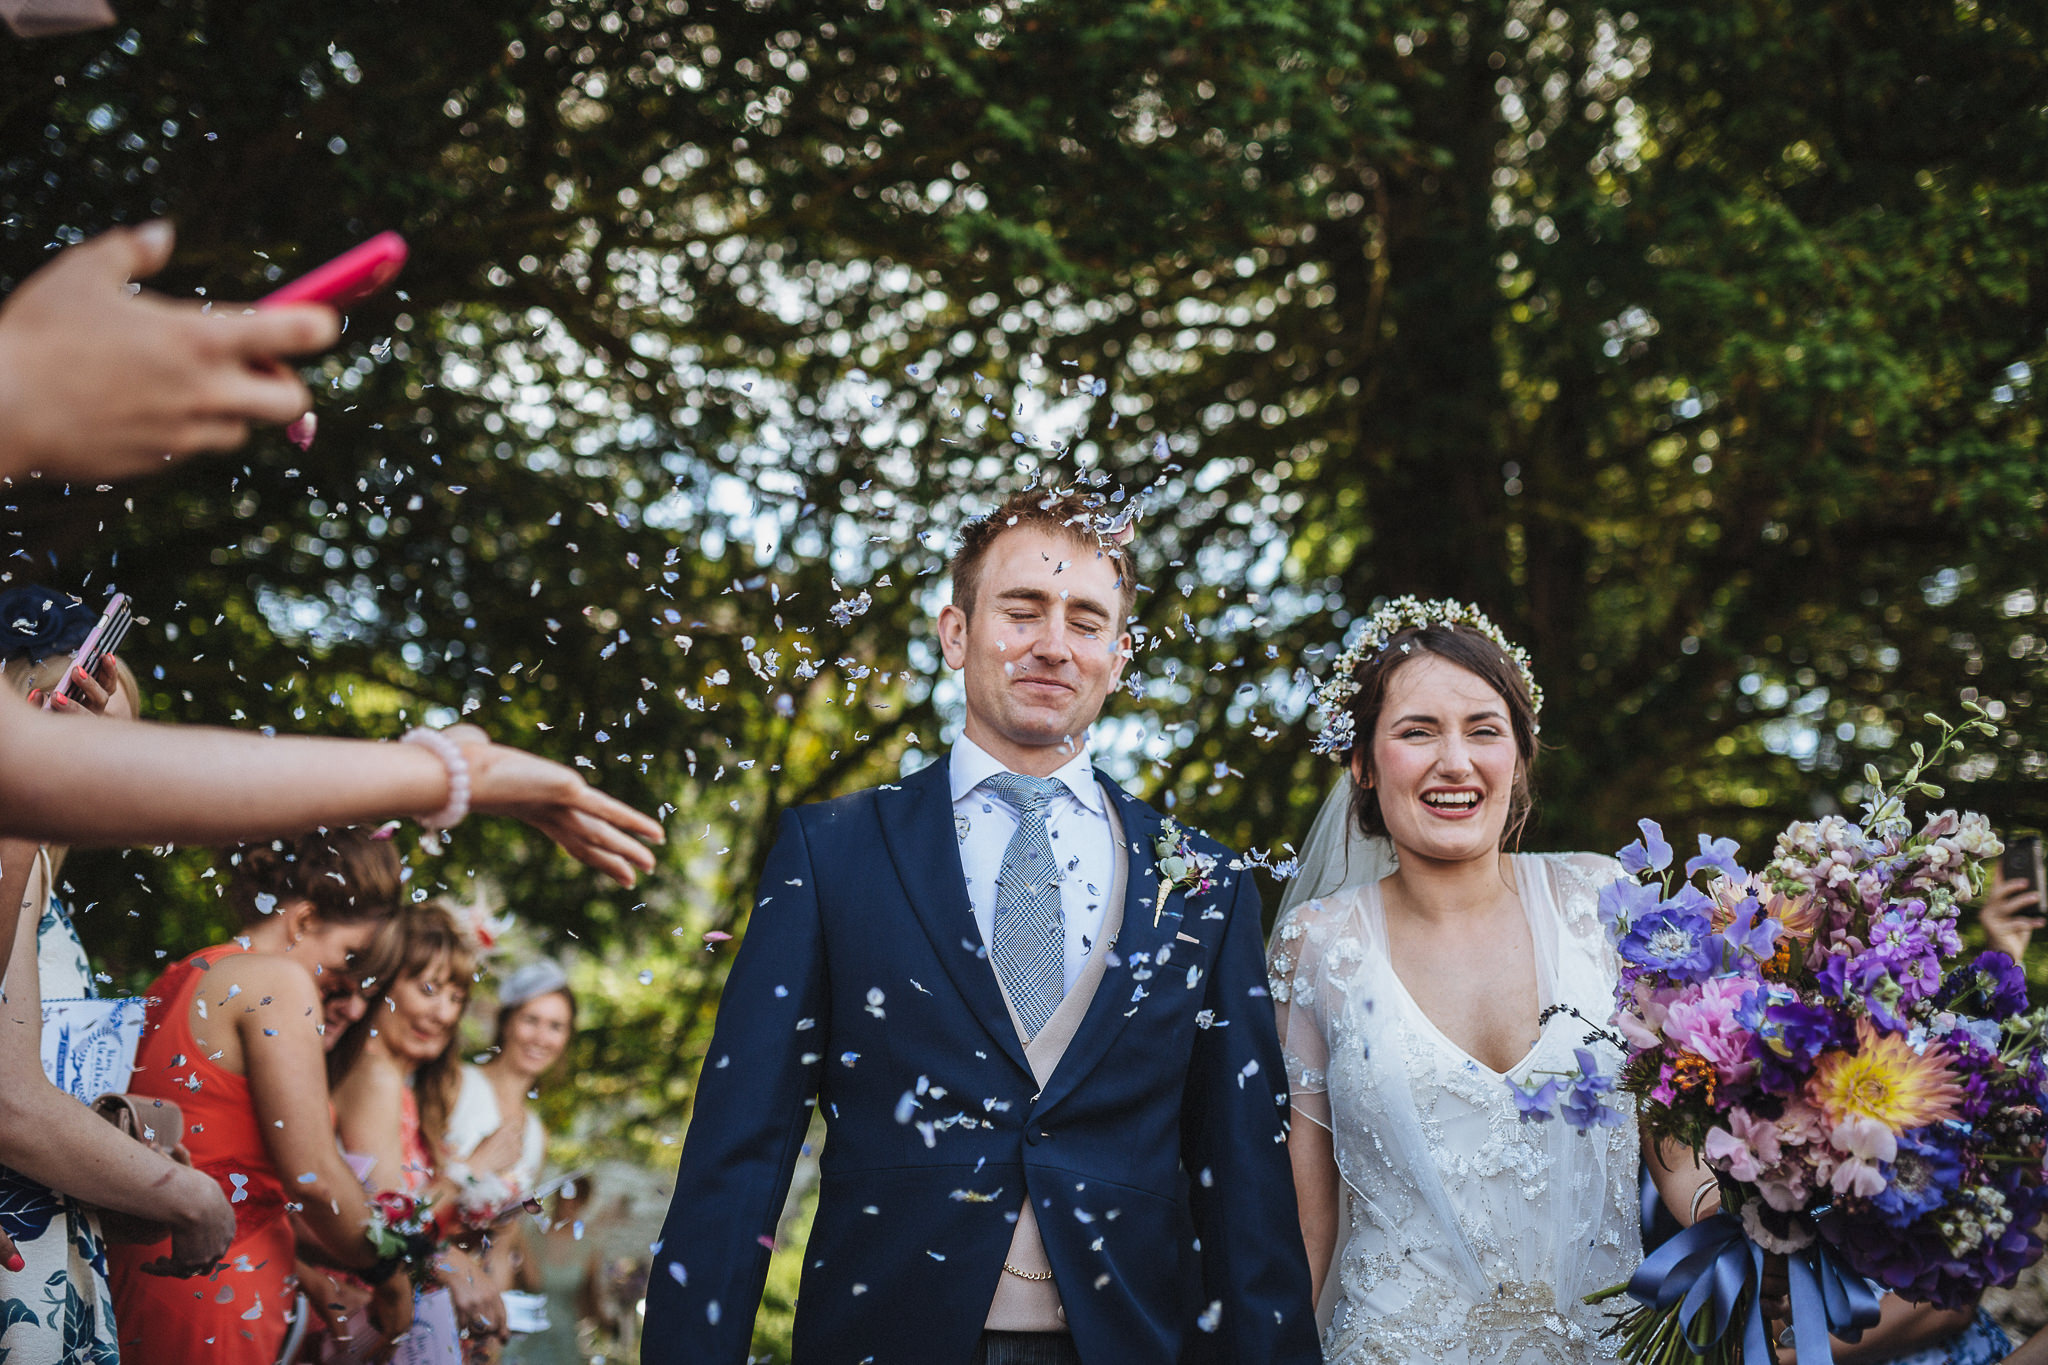 paul-marbrook-Farm-Wedding-Photographer-Lancashire-90036